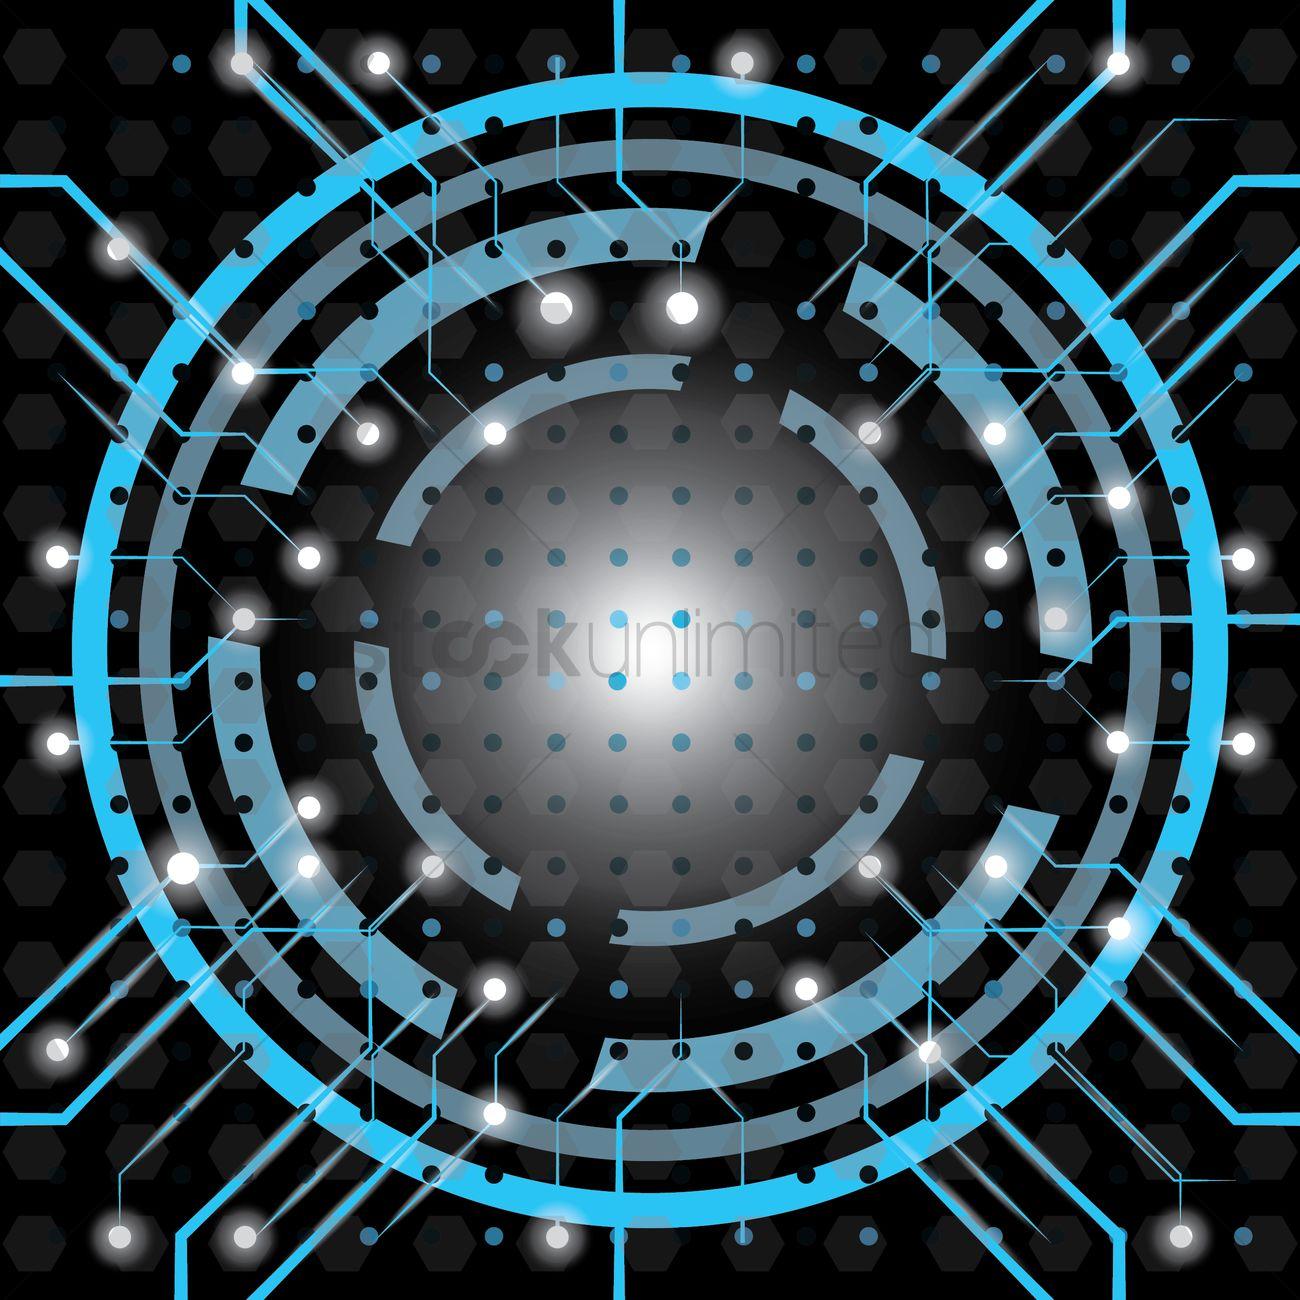 circular circuit design vector image 1807594 stockunlimited